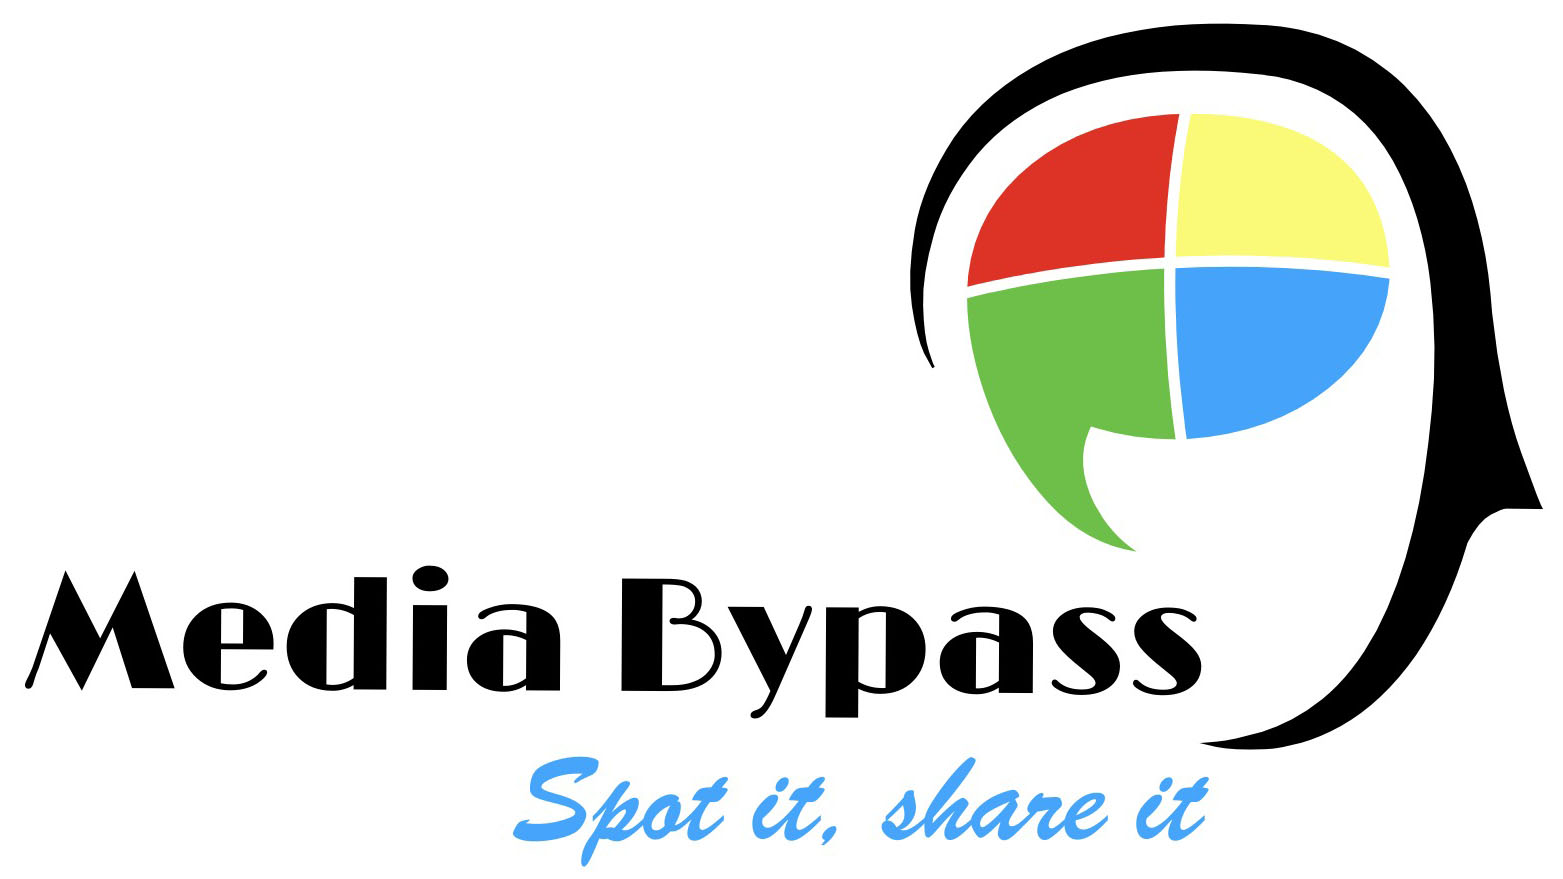 Media Bypass